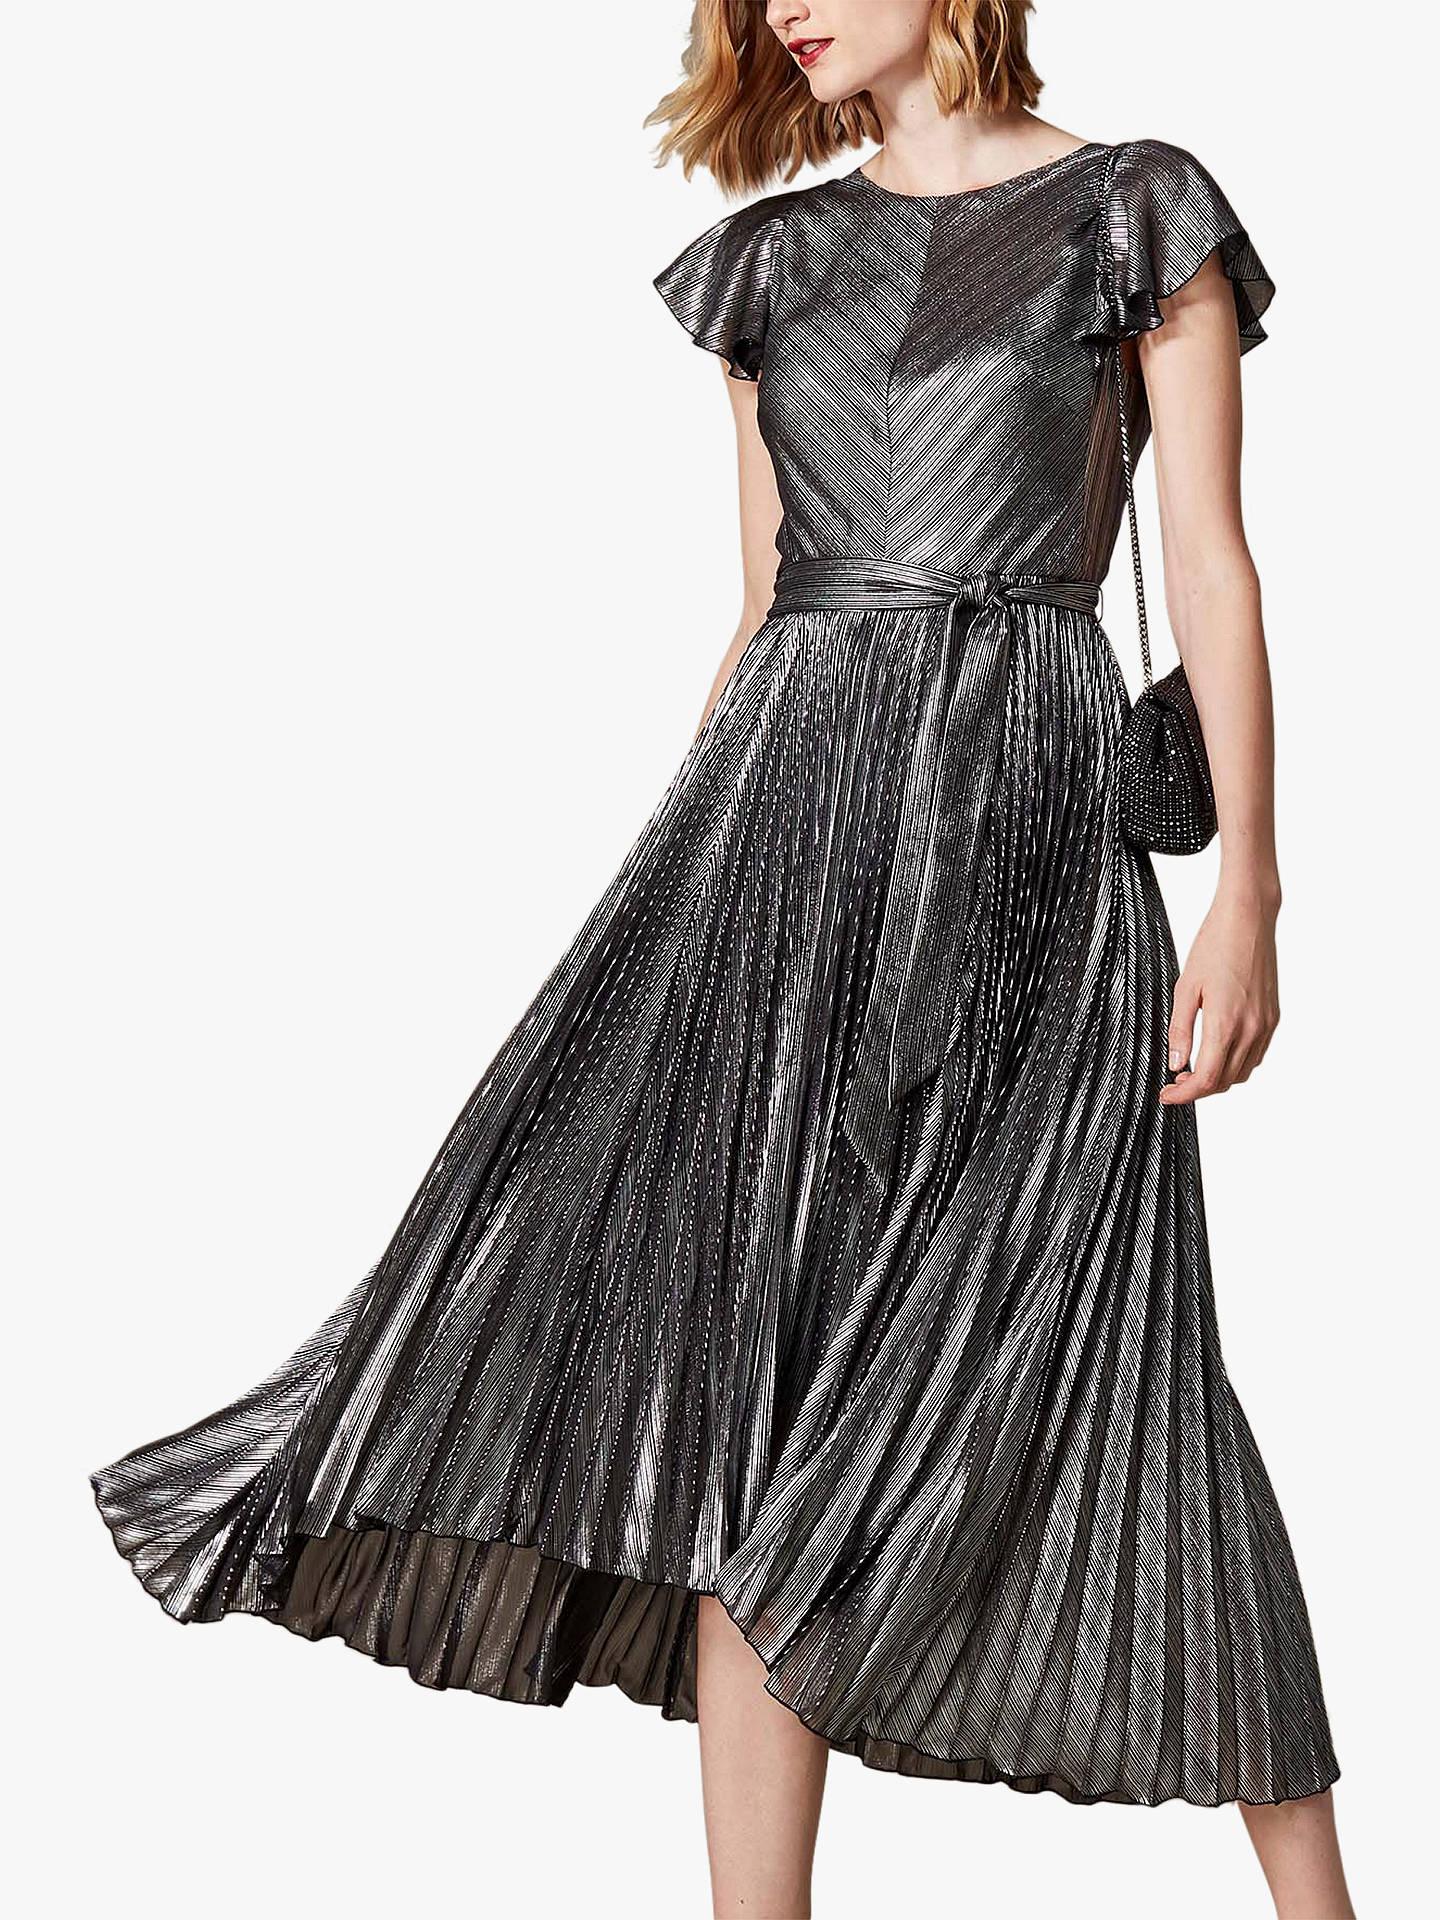 176468a8874 Buy Karen Millen Metallic Pleated Midi Dress, Silver, 6 Online at  johnlewis.com ...